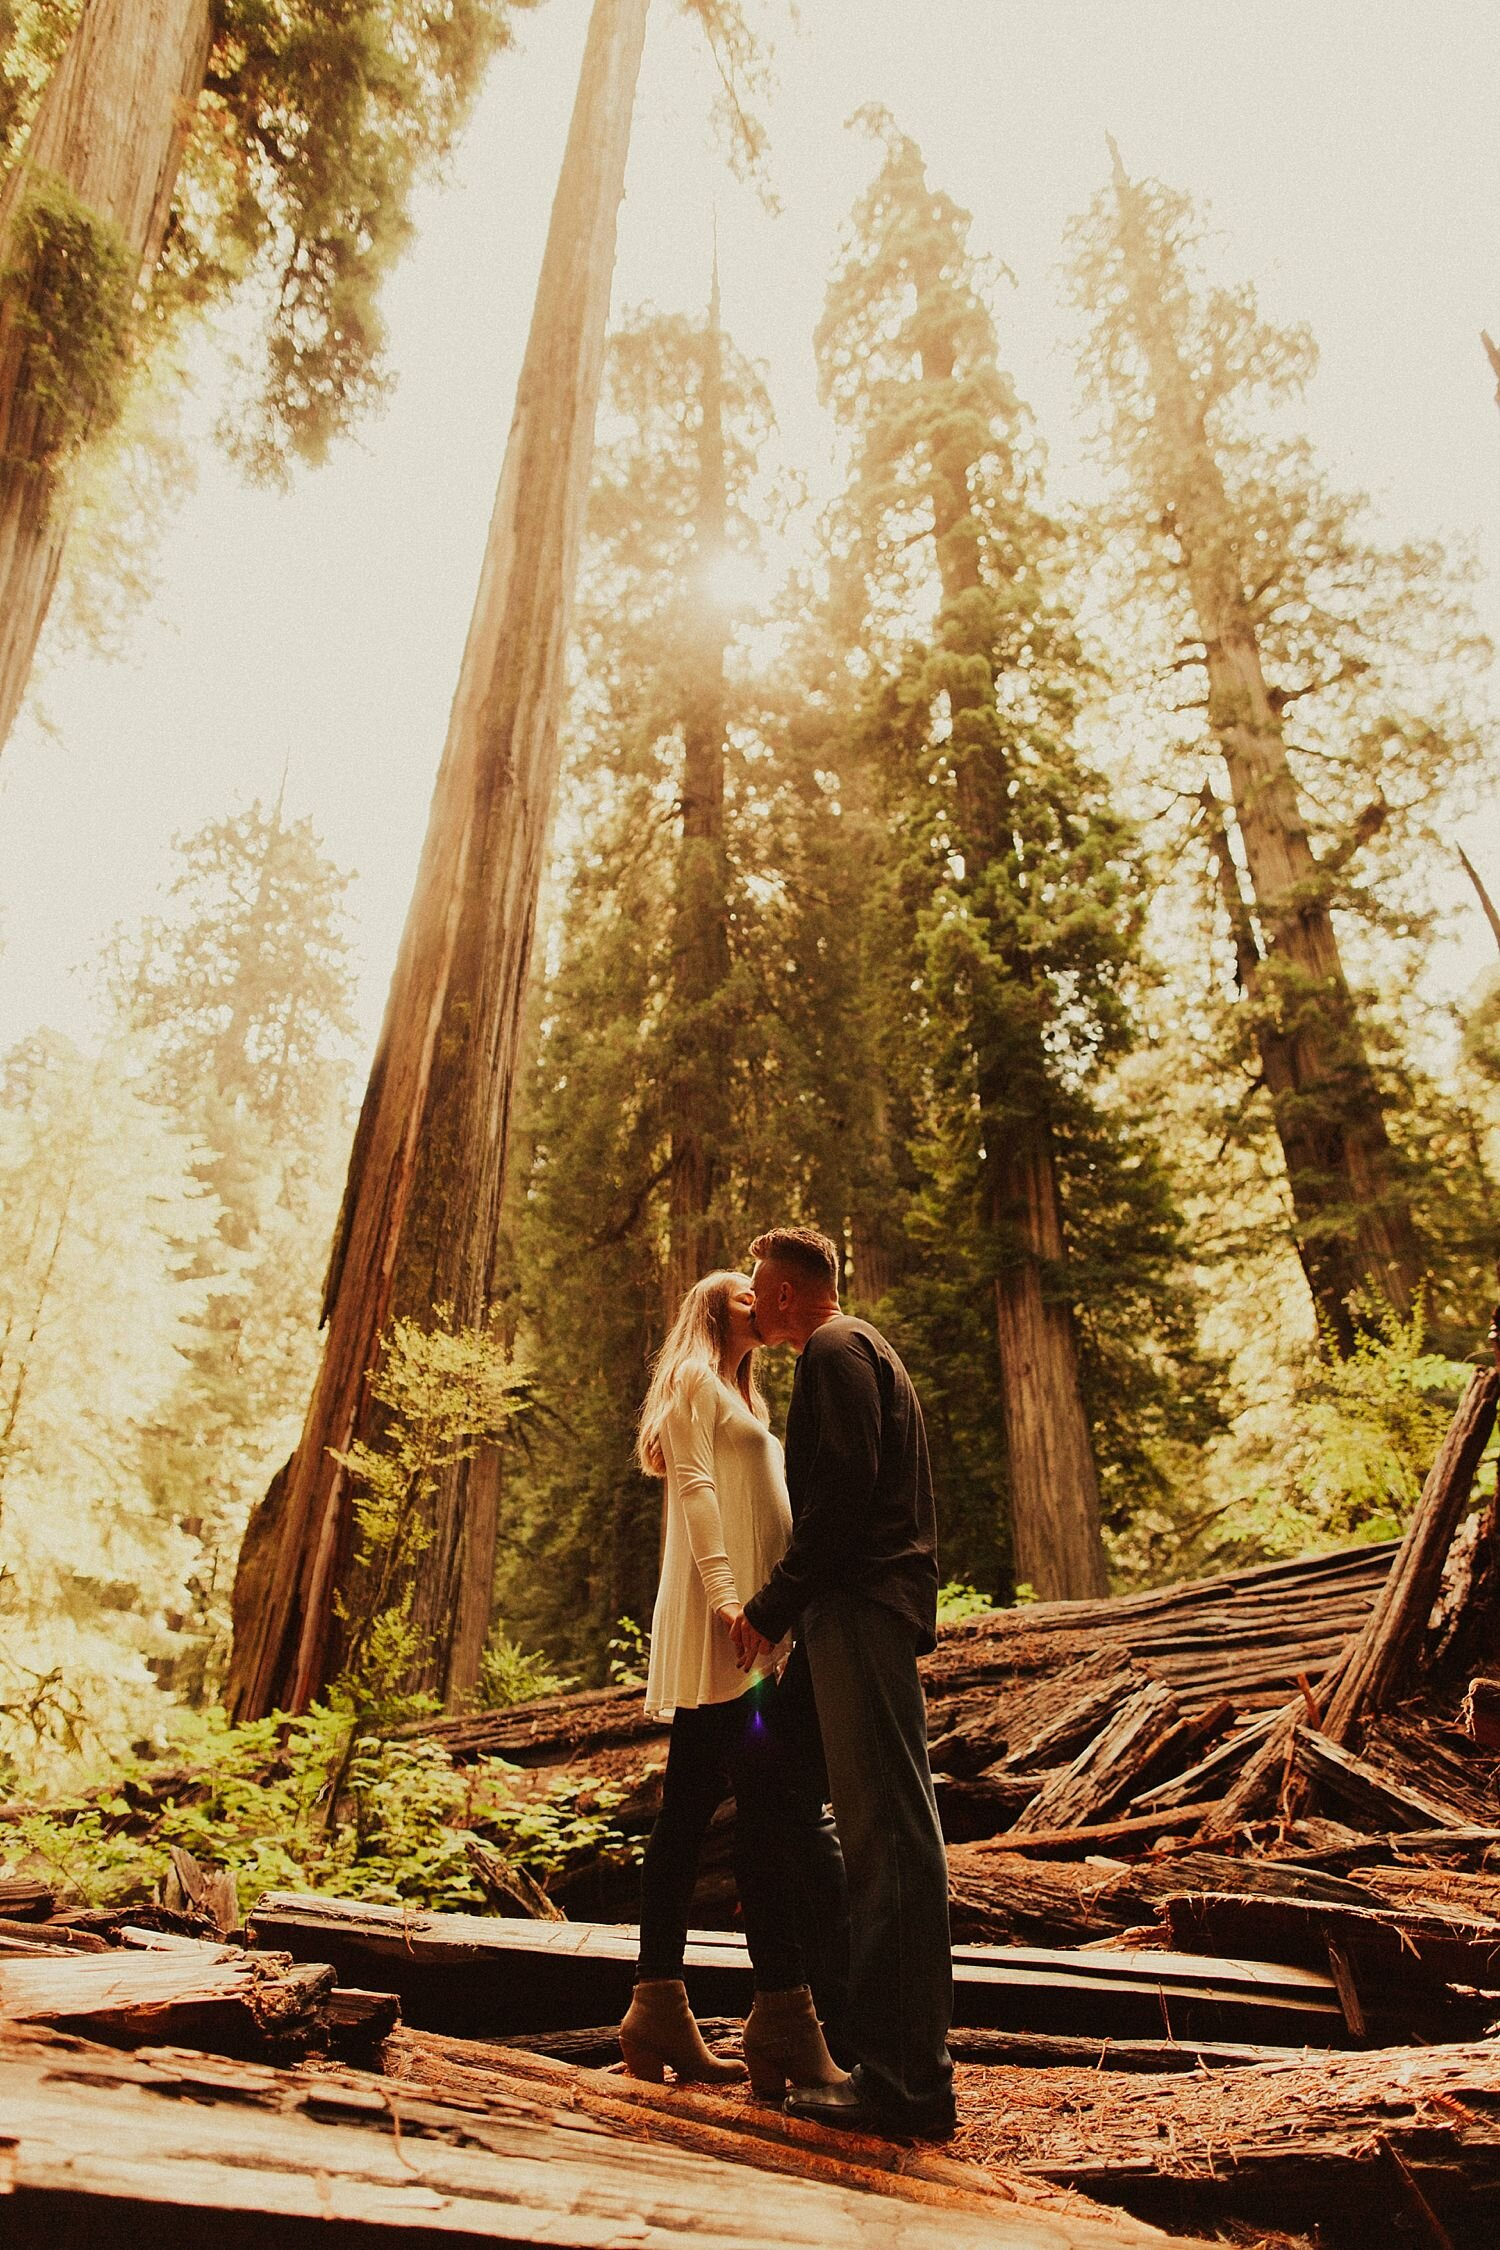 redwoods-california-maternity-photos_4330.jpg